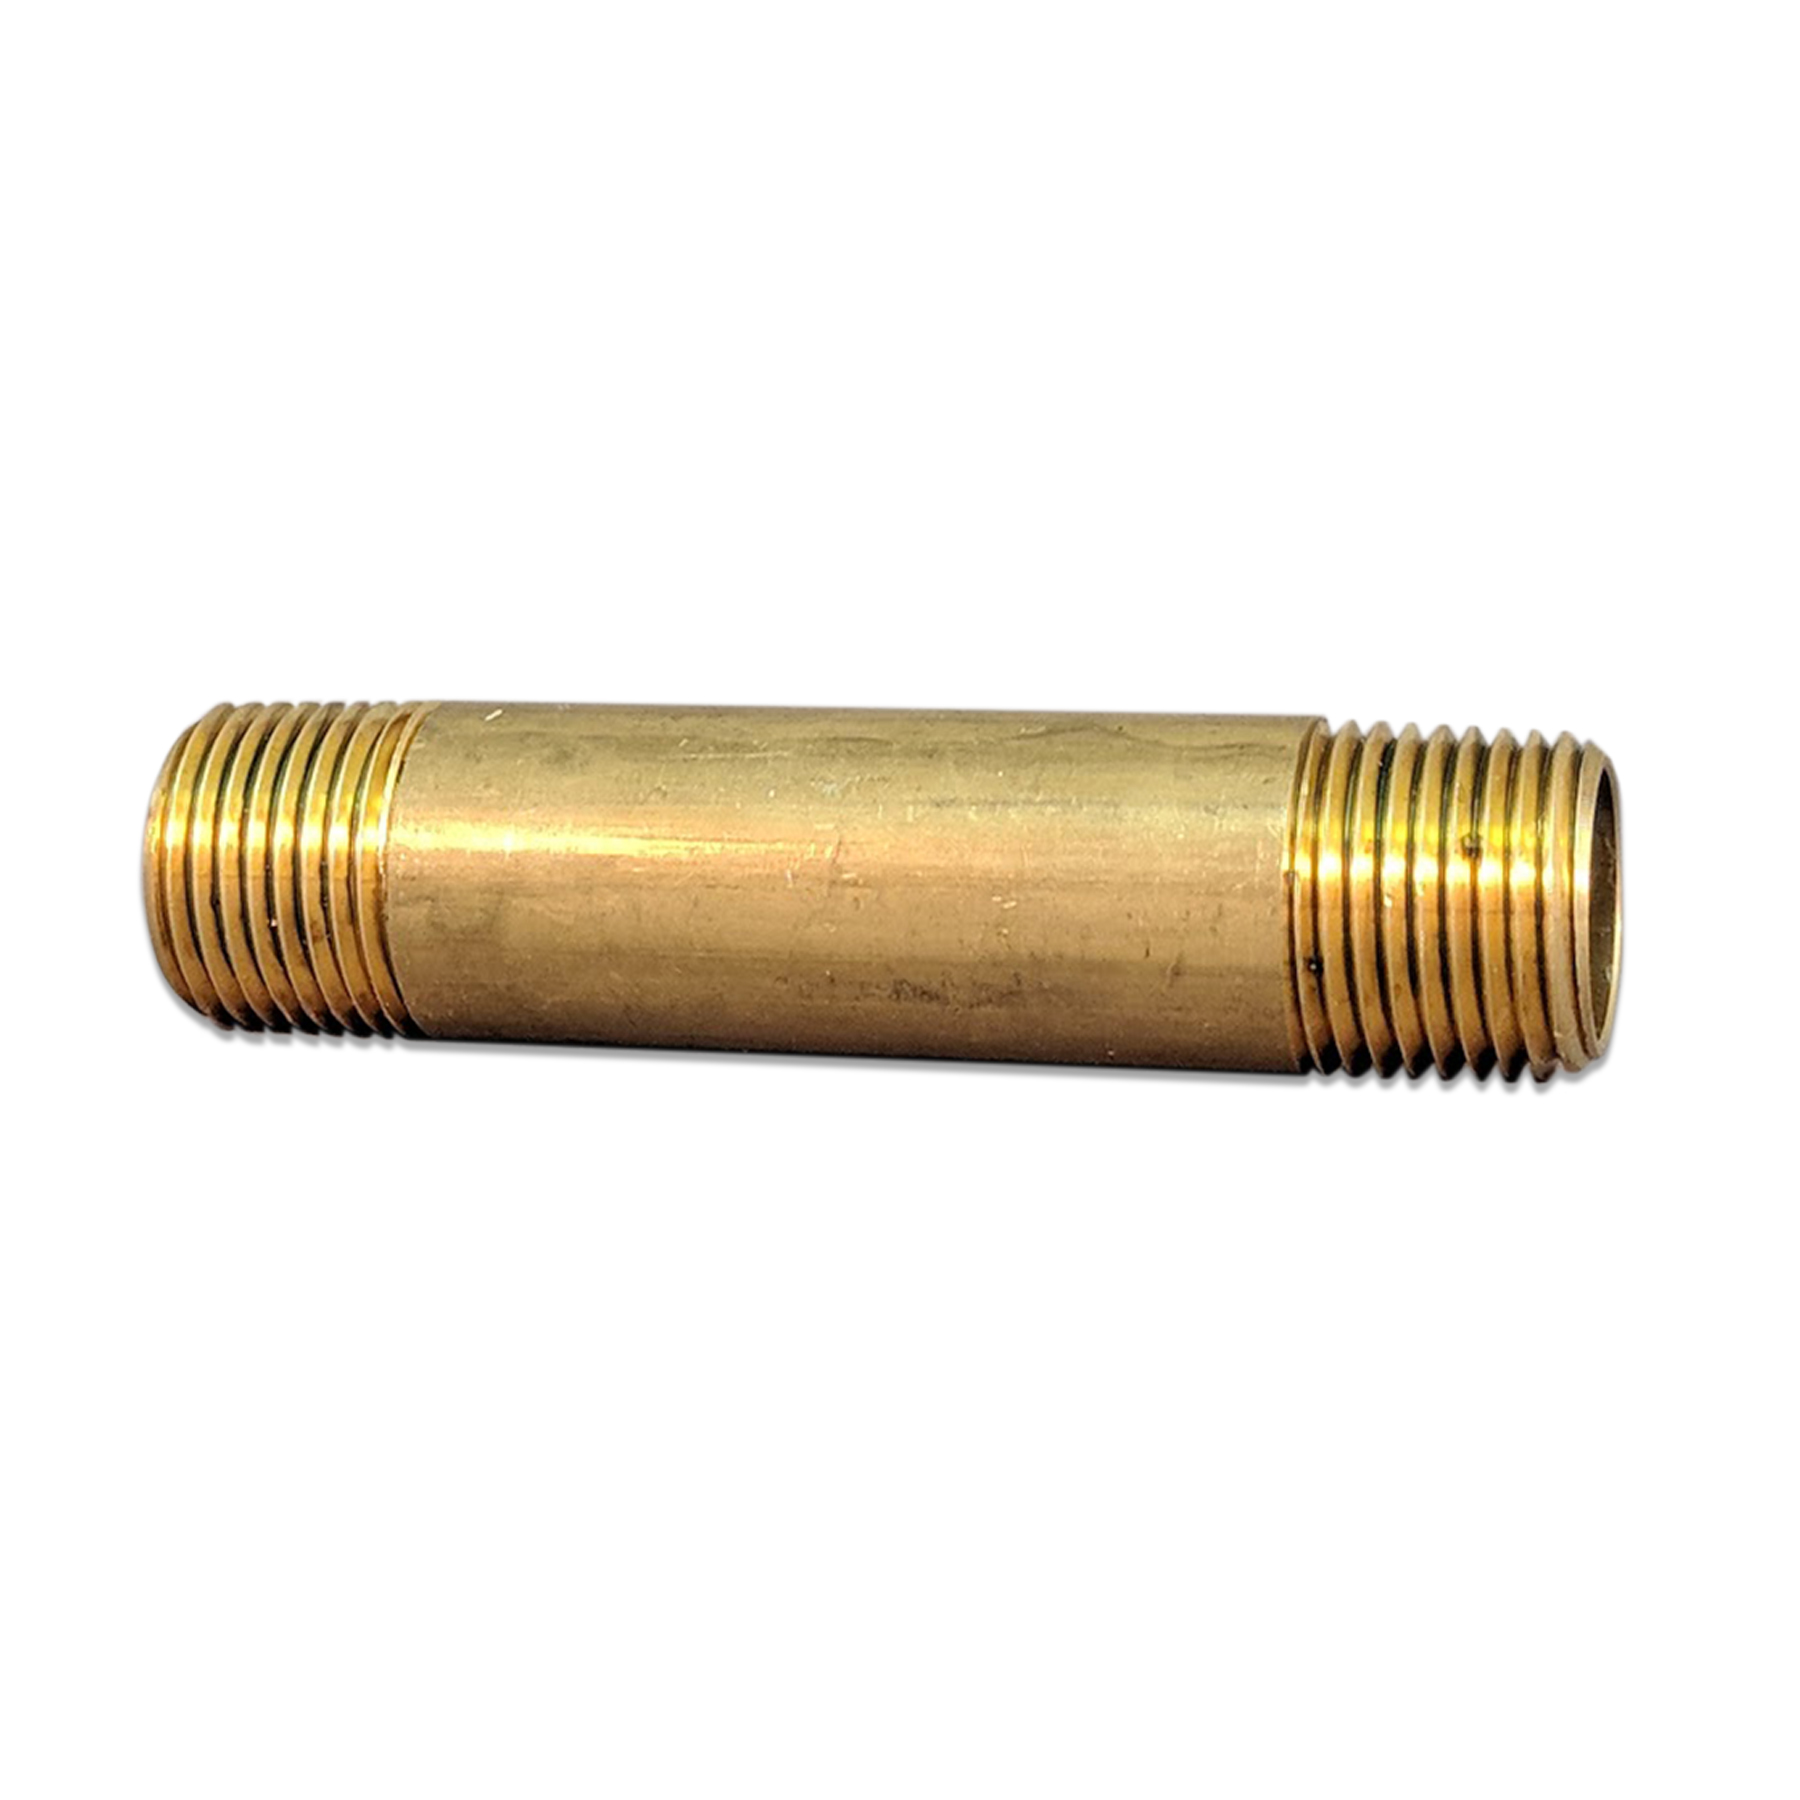 Brass Nipple Fitting, 1/2 in. (M) NPT x 3-1/2 in.